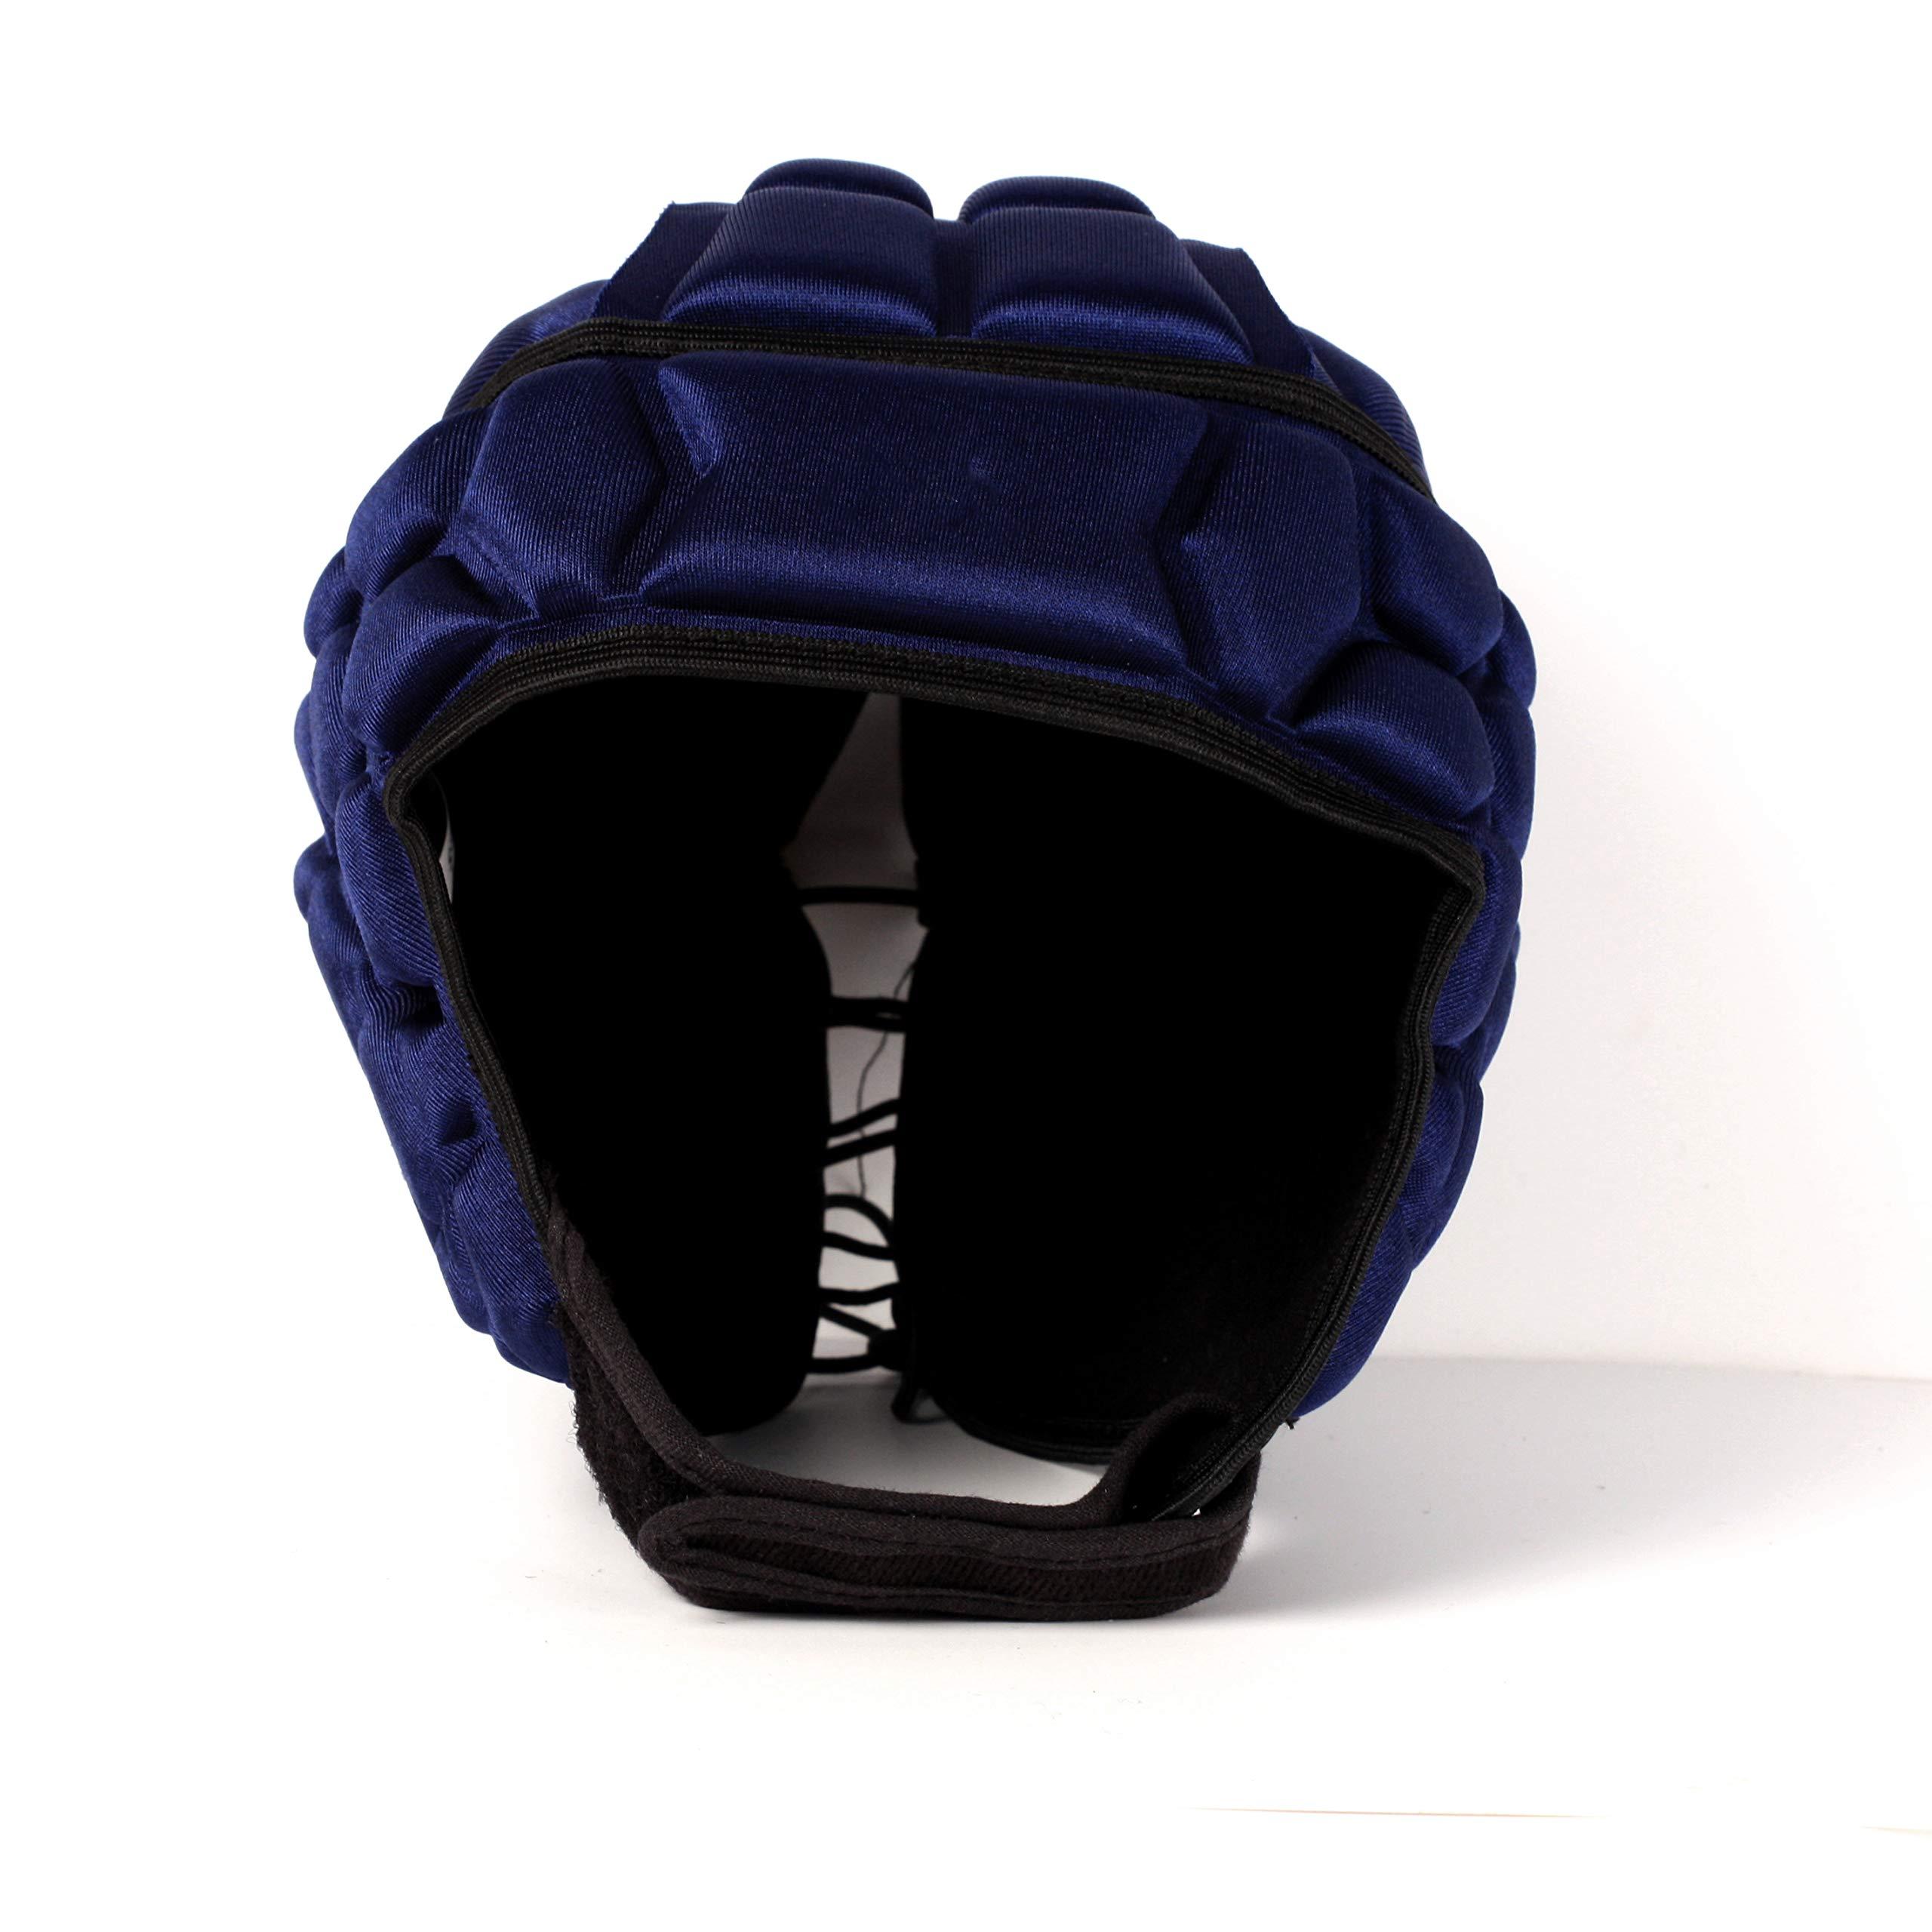 Barnett Heat Pro Helmet - Navy Blue - XS